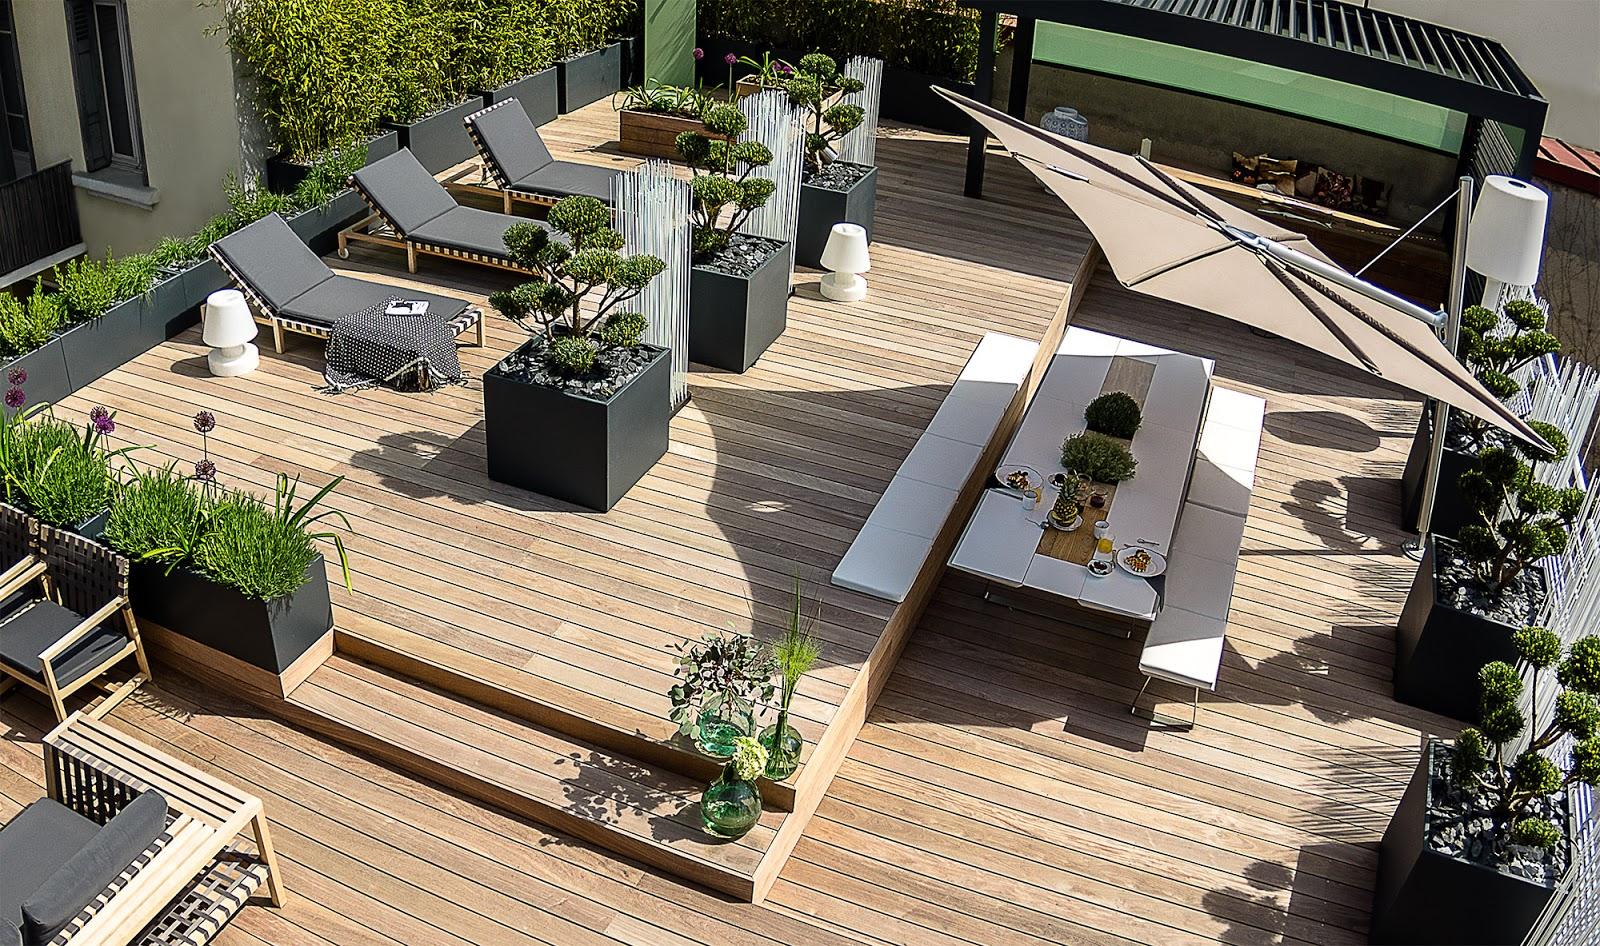 bac bambou terrasse beautiful dco terrasse bambou dco ide with bac bambou terrasse cheap. Black Bedroom Furniture Sets. Home Design Ideas